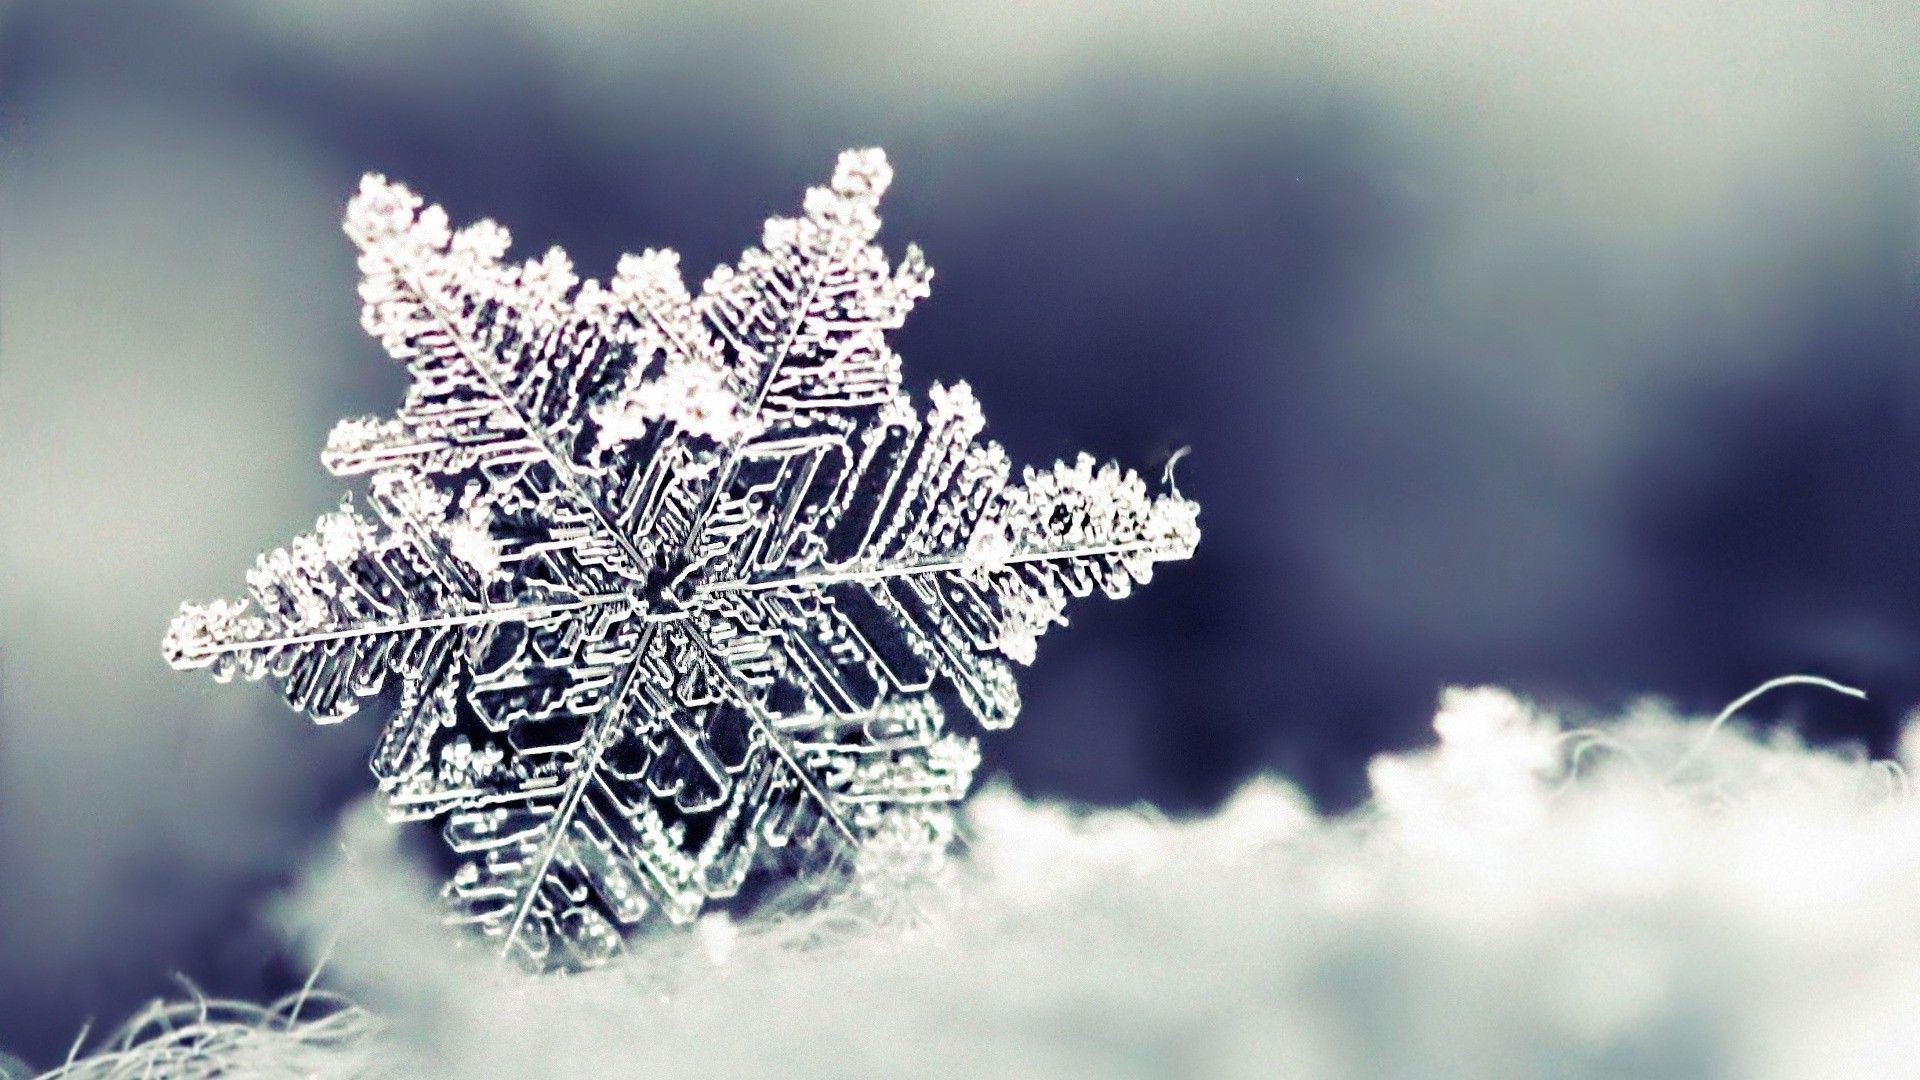 Snowflake HD desktop wallpaper Widescreen High